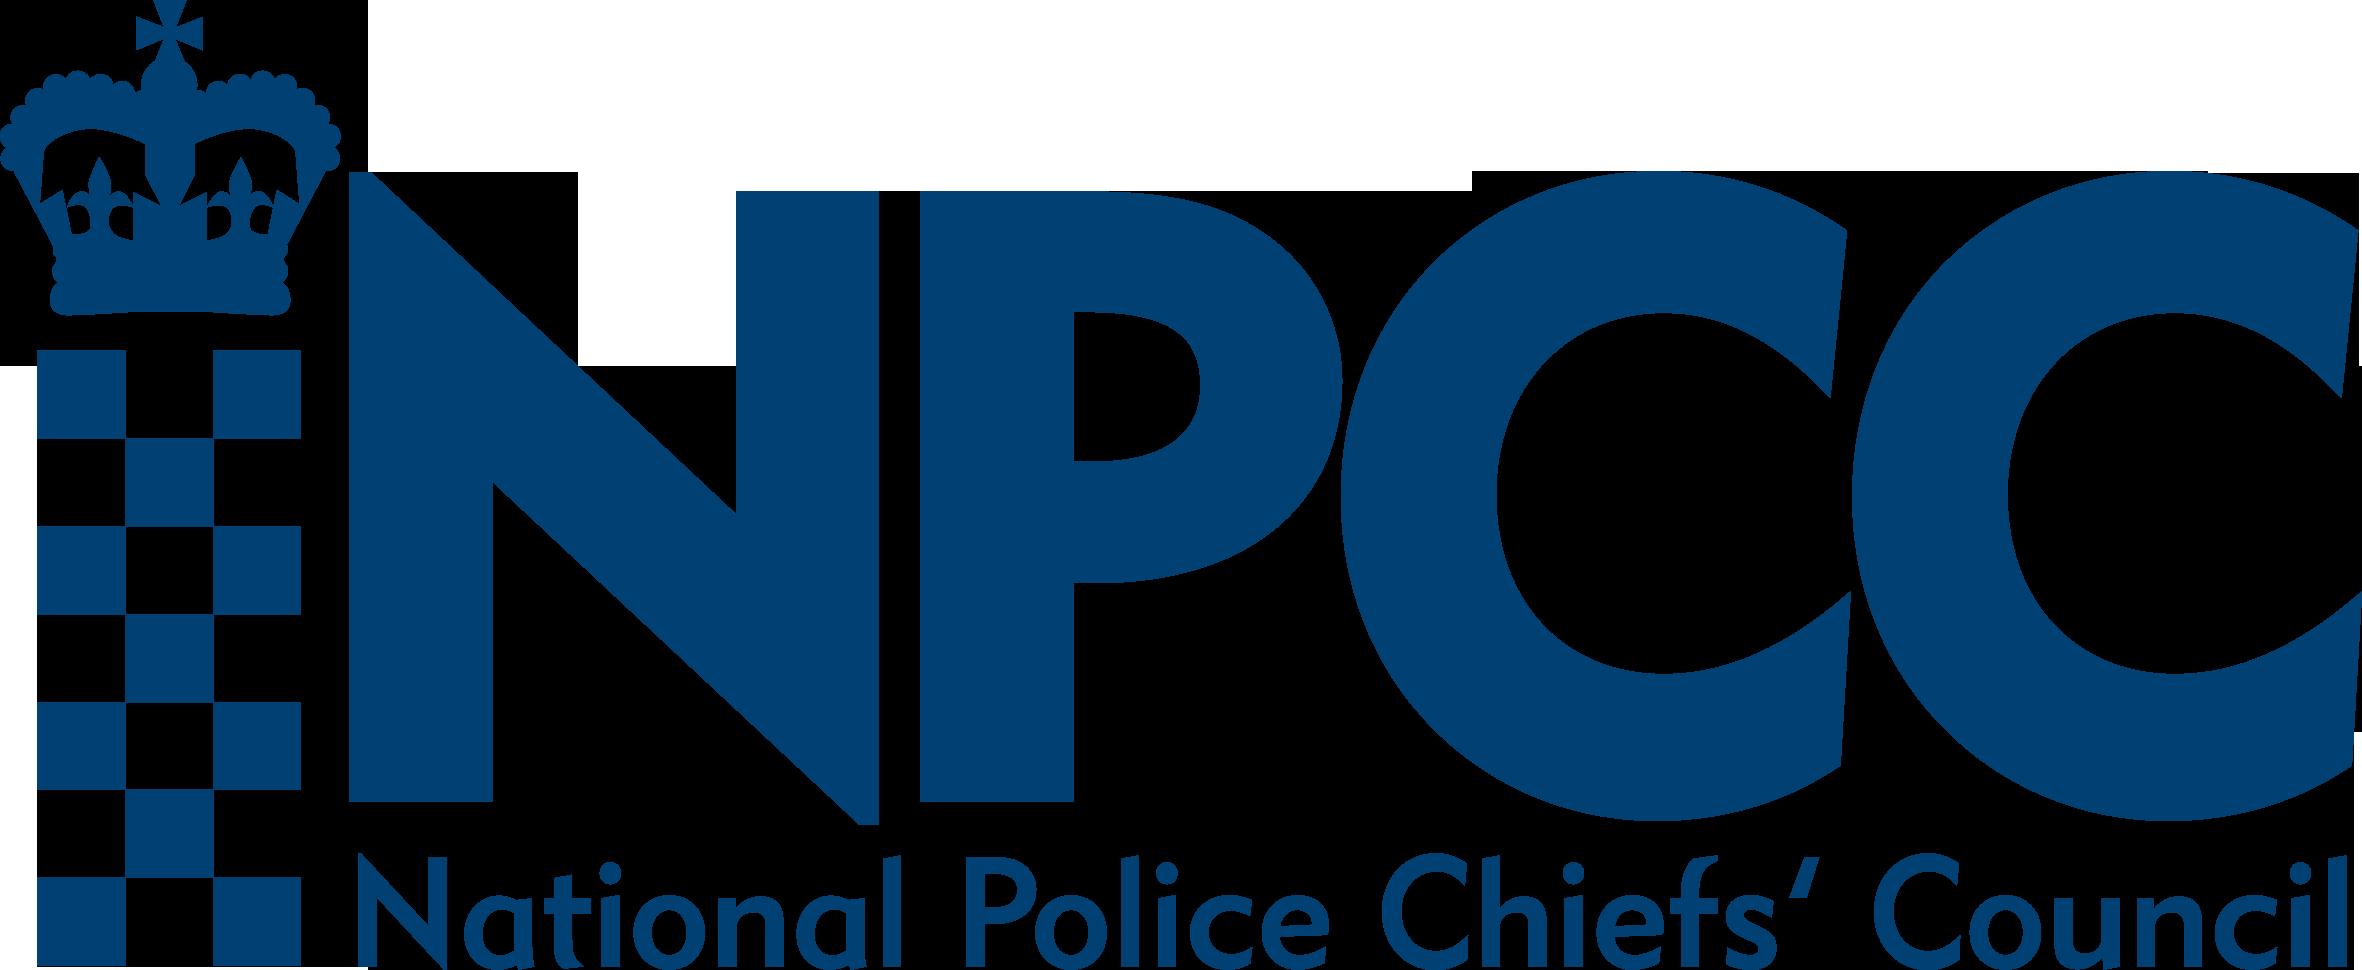 National Polic Chief's Council Logo